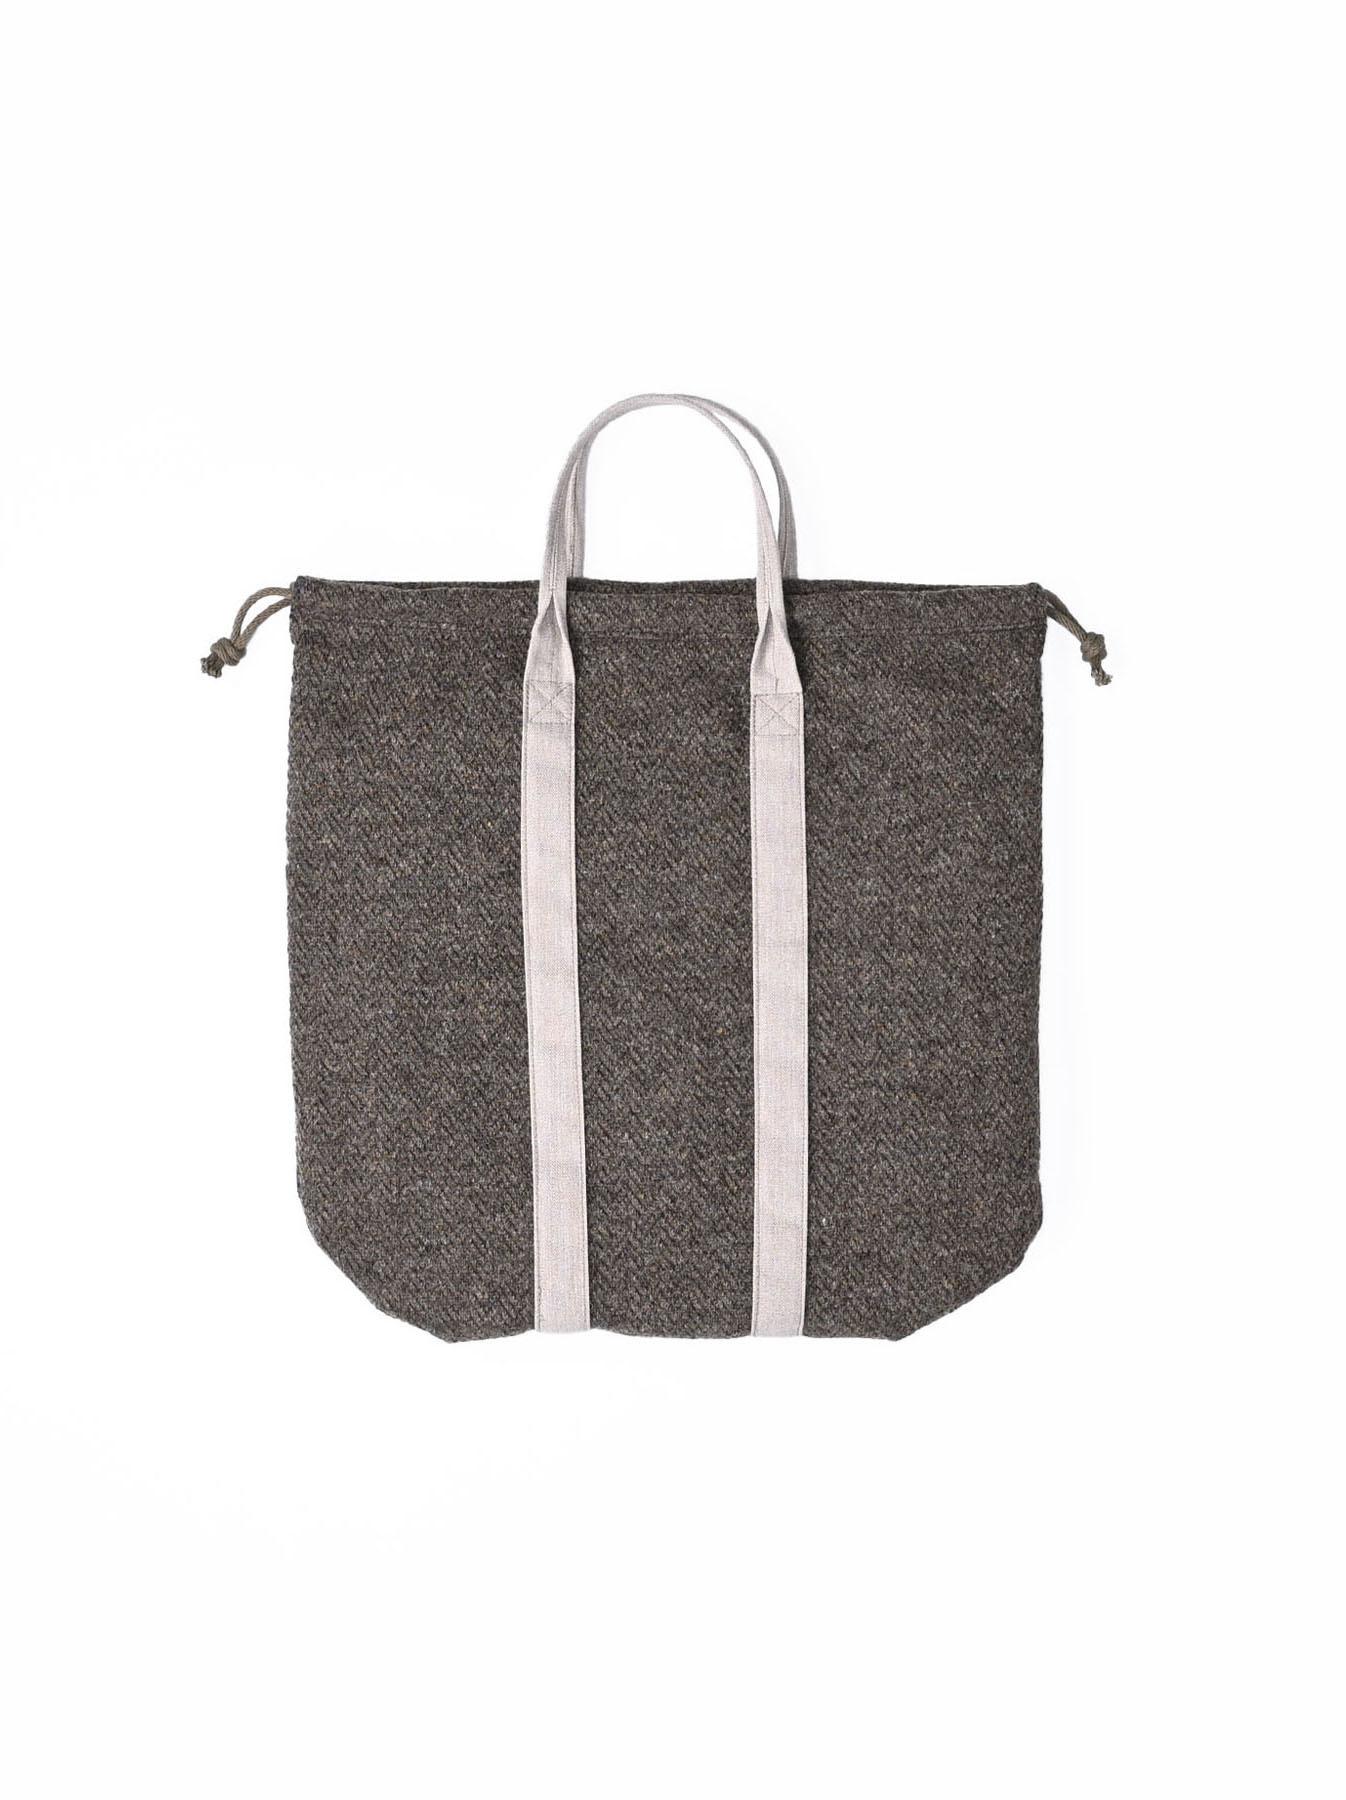 Tweed Knit and Nylon Tote Bag-5